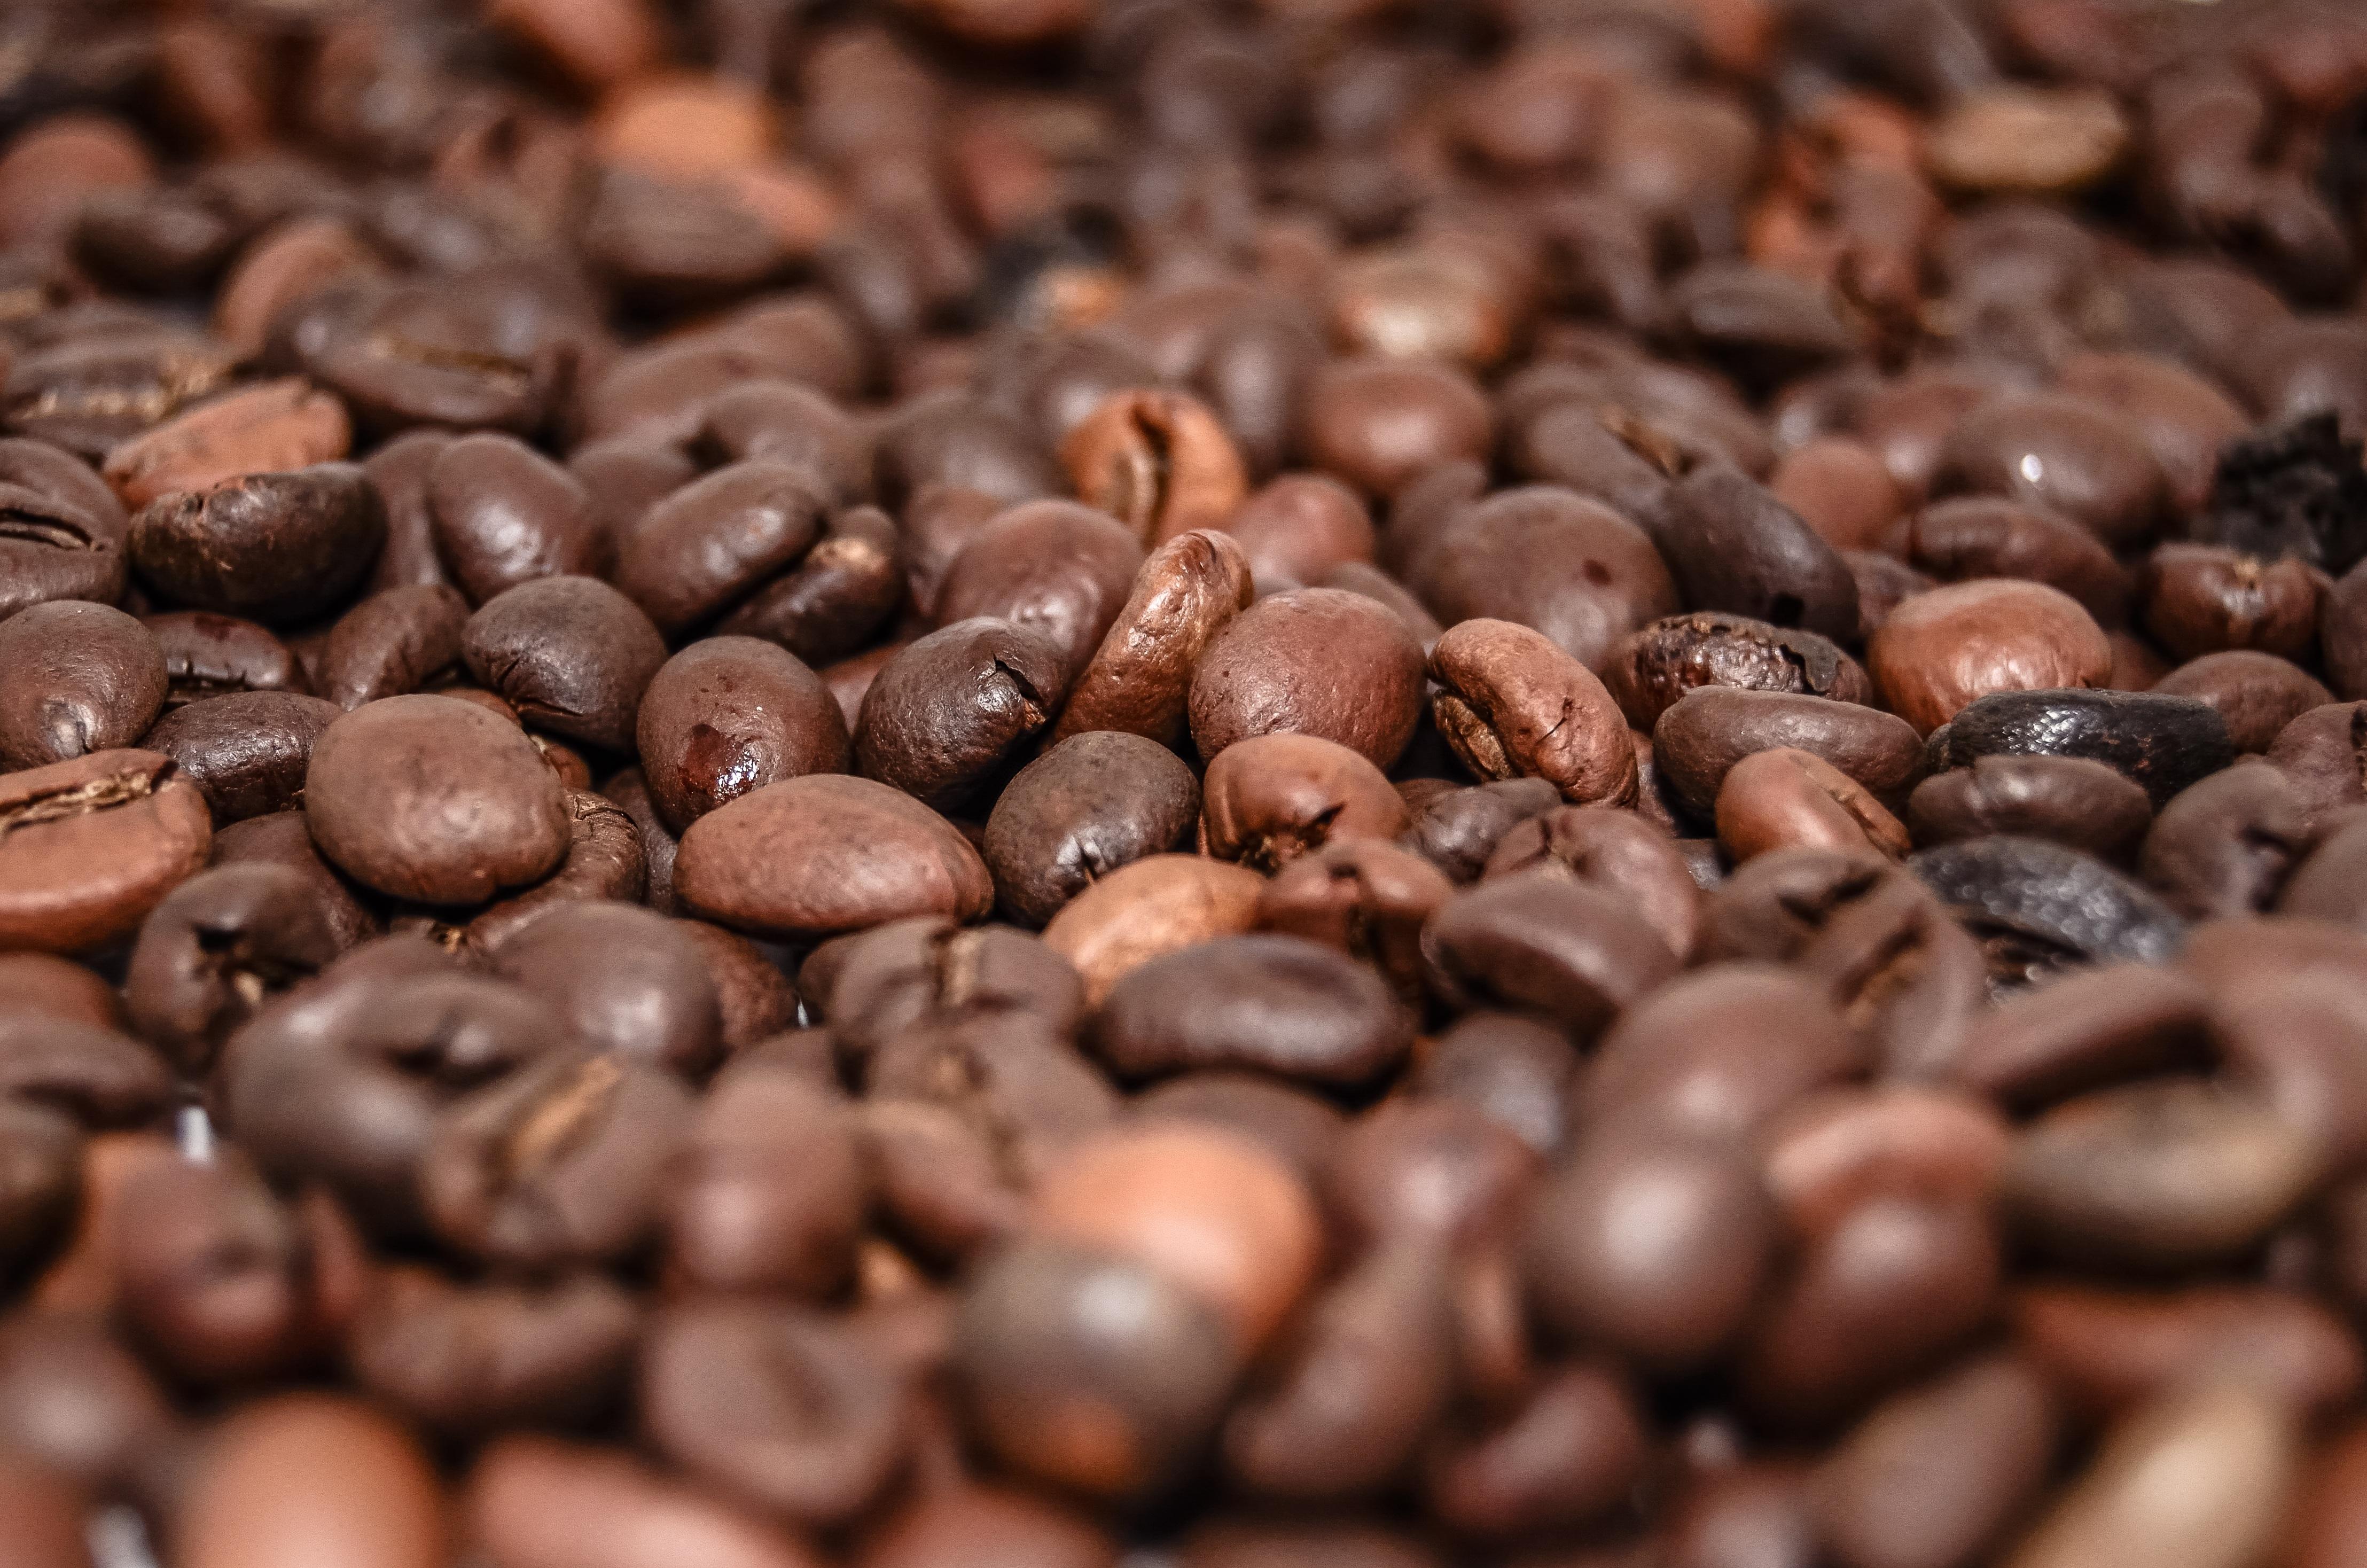 кофе кофеин картинки будущем тебе